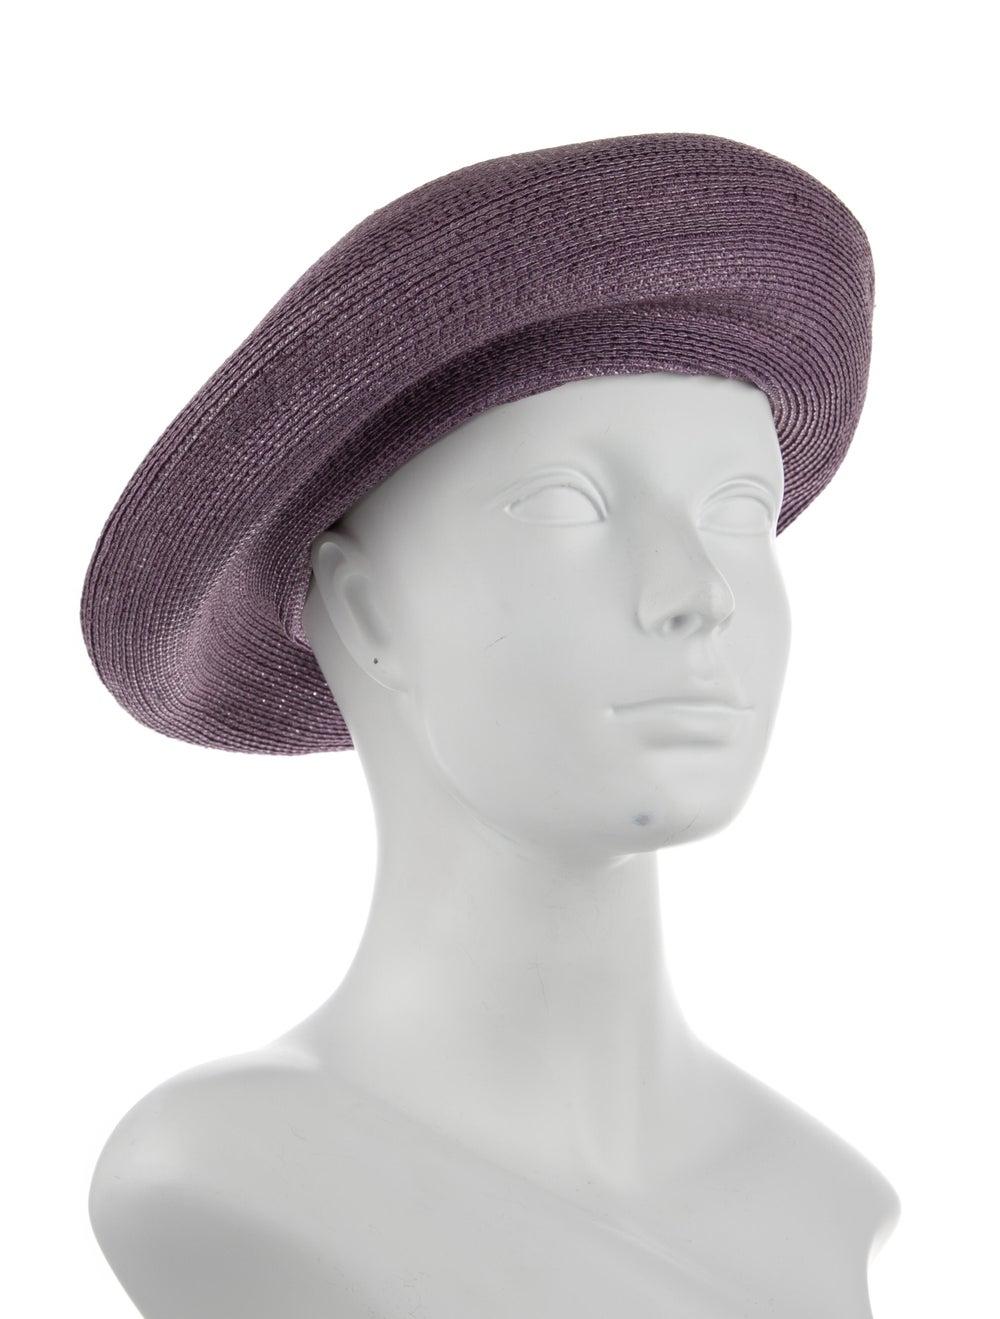 Patricia Underwood Straw Beret Purple - image 3